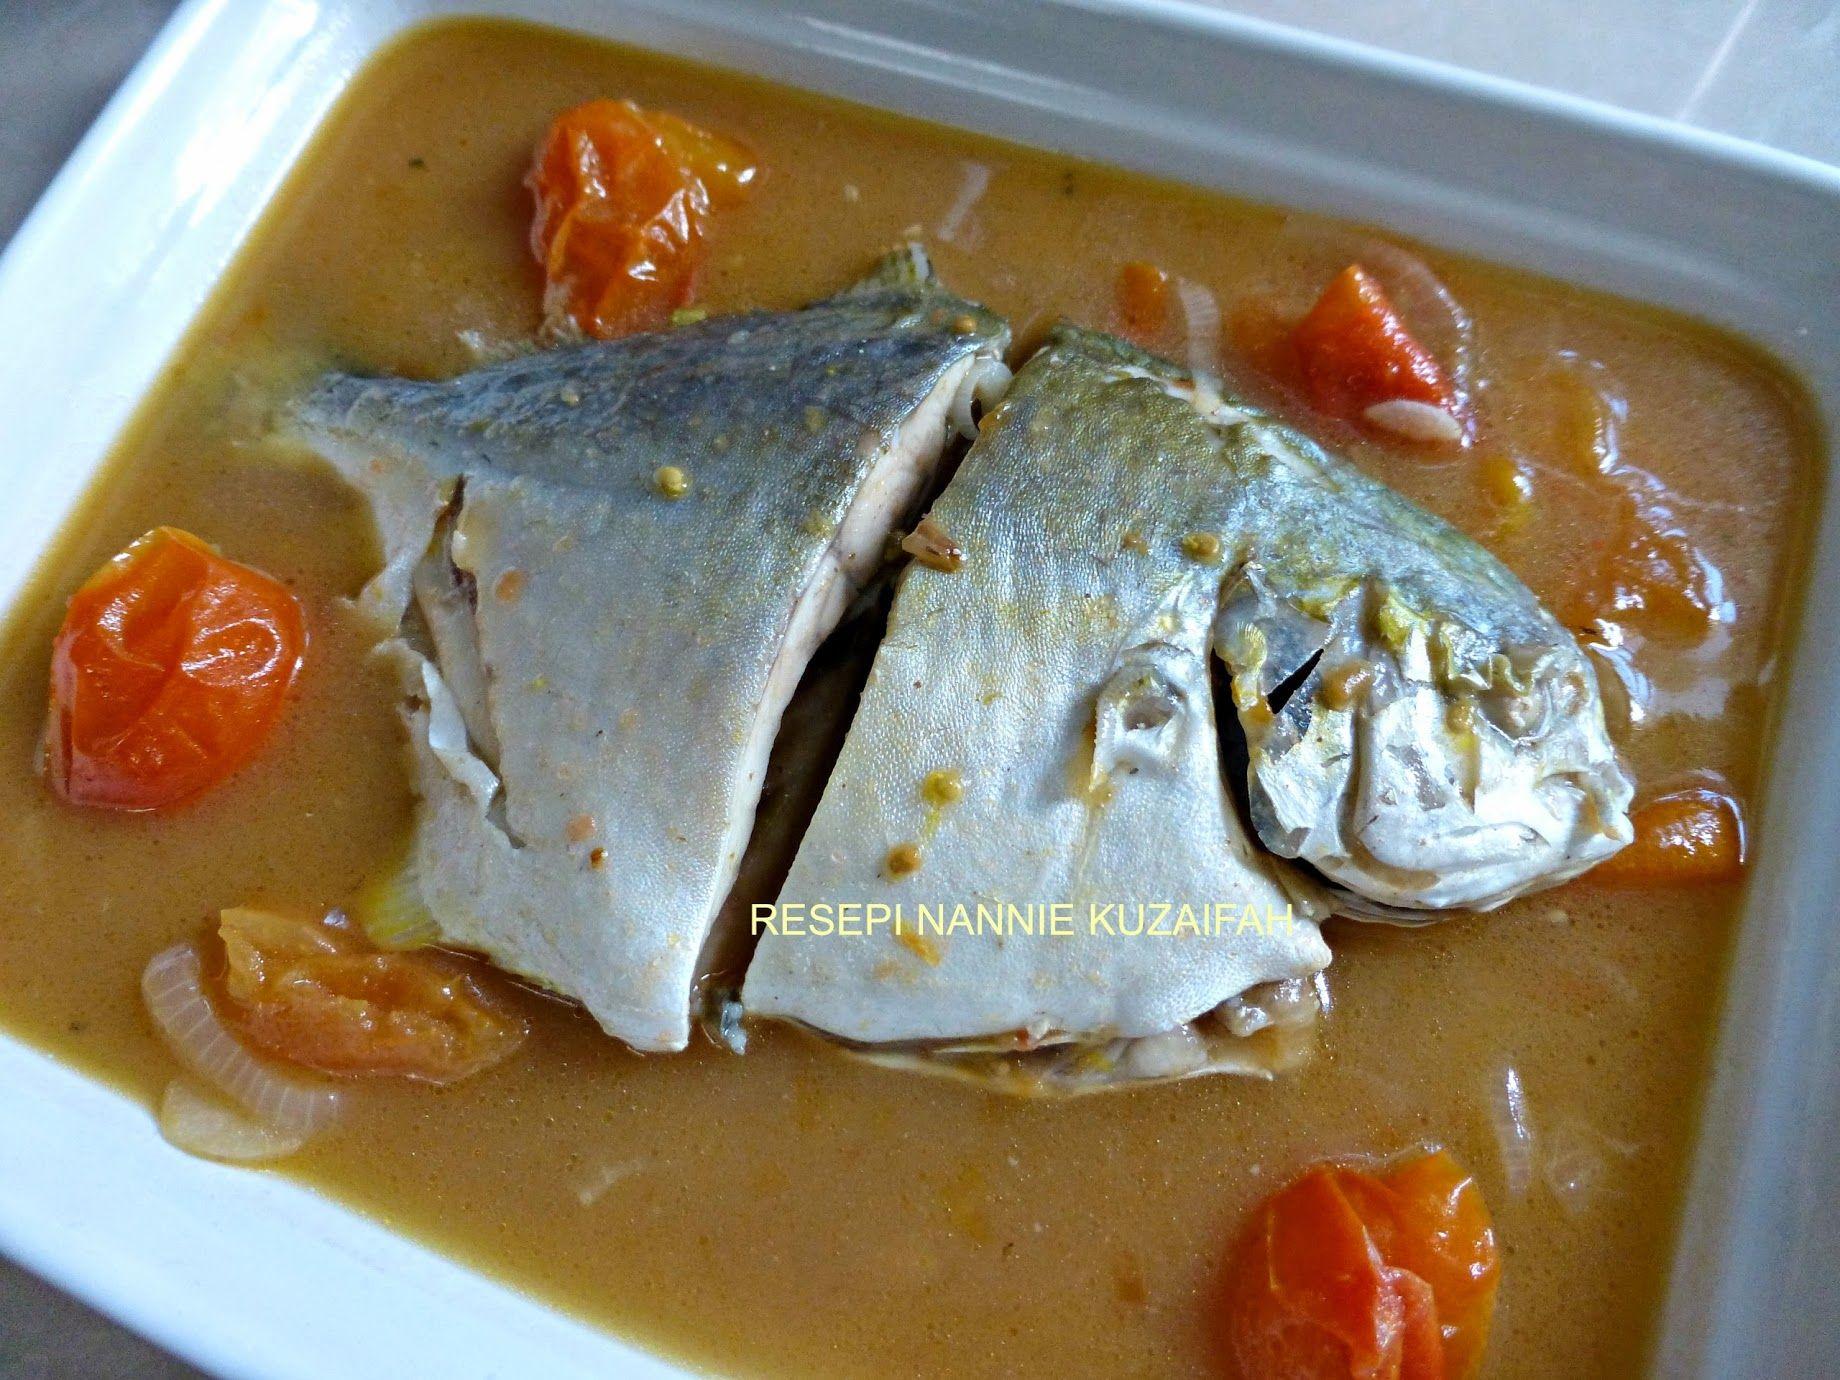 Resepi Nennie Khuzaifah Masak Rebus Ikan Bawal Emas Cooking Food Curry